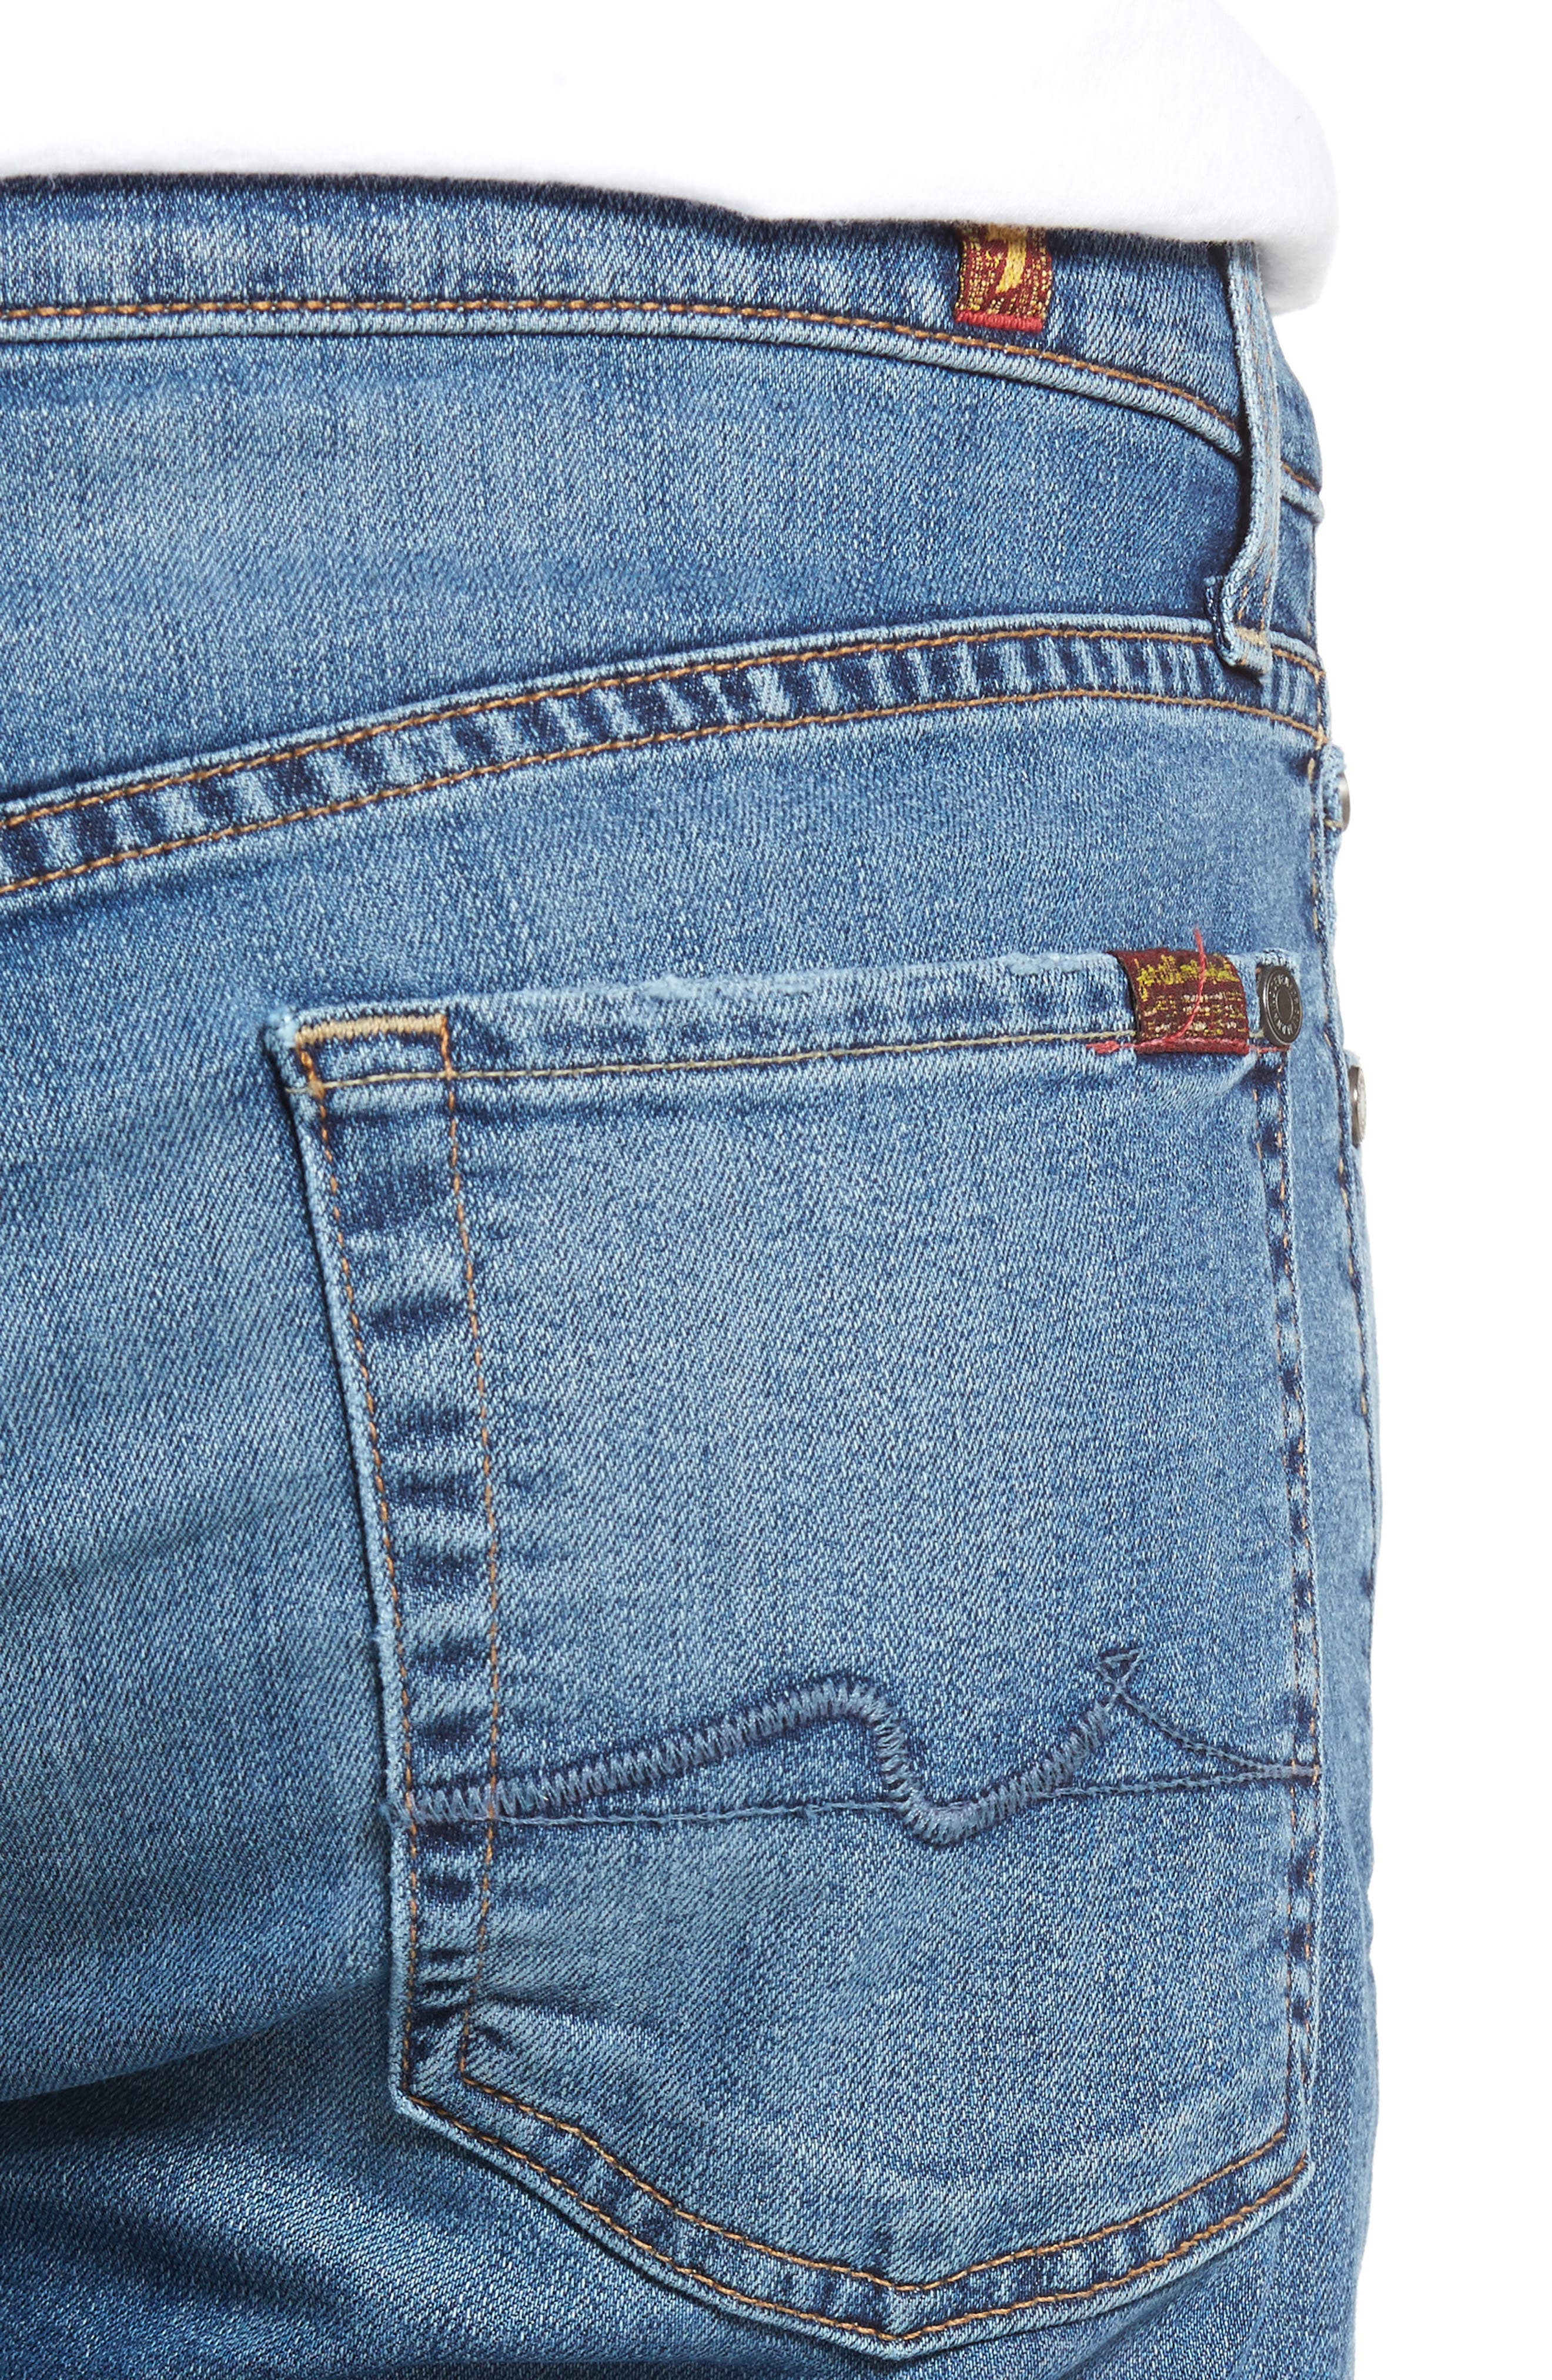 Slimmy Slim Fit Jeans,                             Alternate thumbnail 4, color,                             405